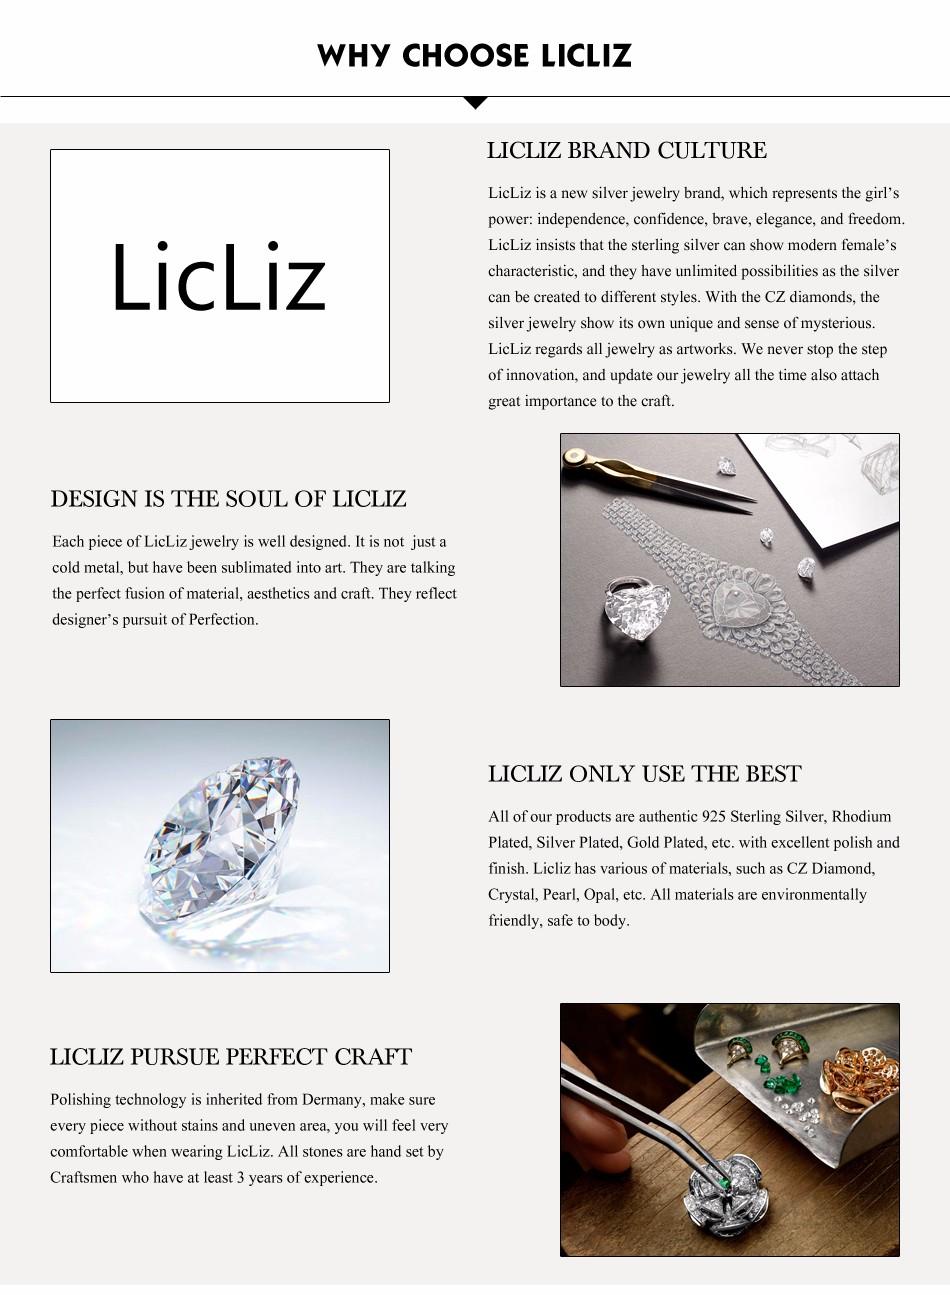 LicLiz Unique 925 Sterling Silver Circle Simple Strip Bar Pendant Necklaces Adjustable Chain Necklaces for Women Wedding LN0194 10